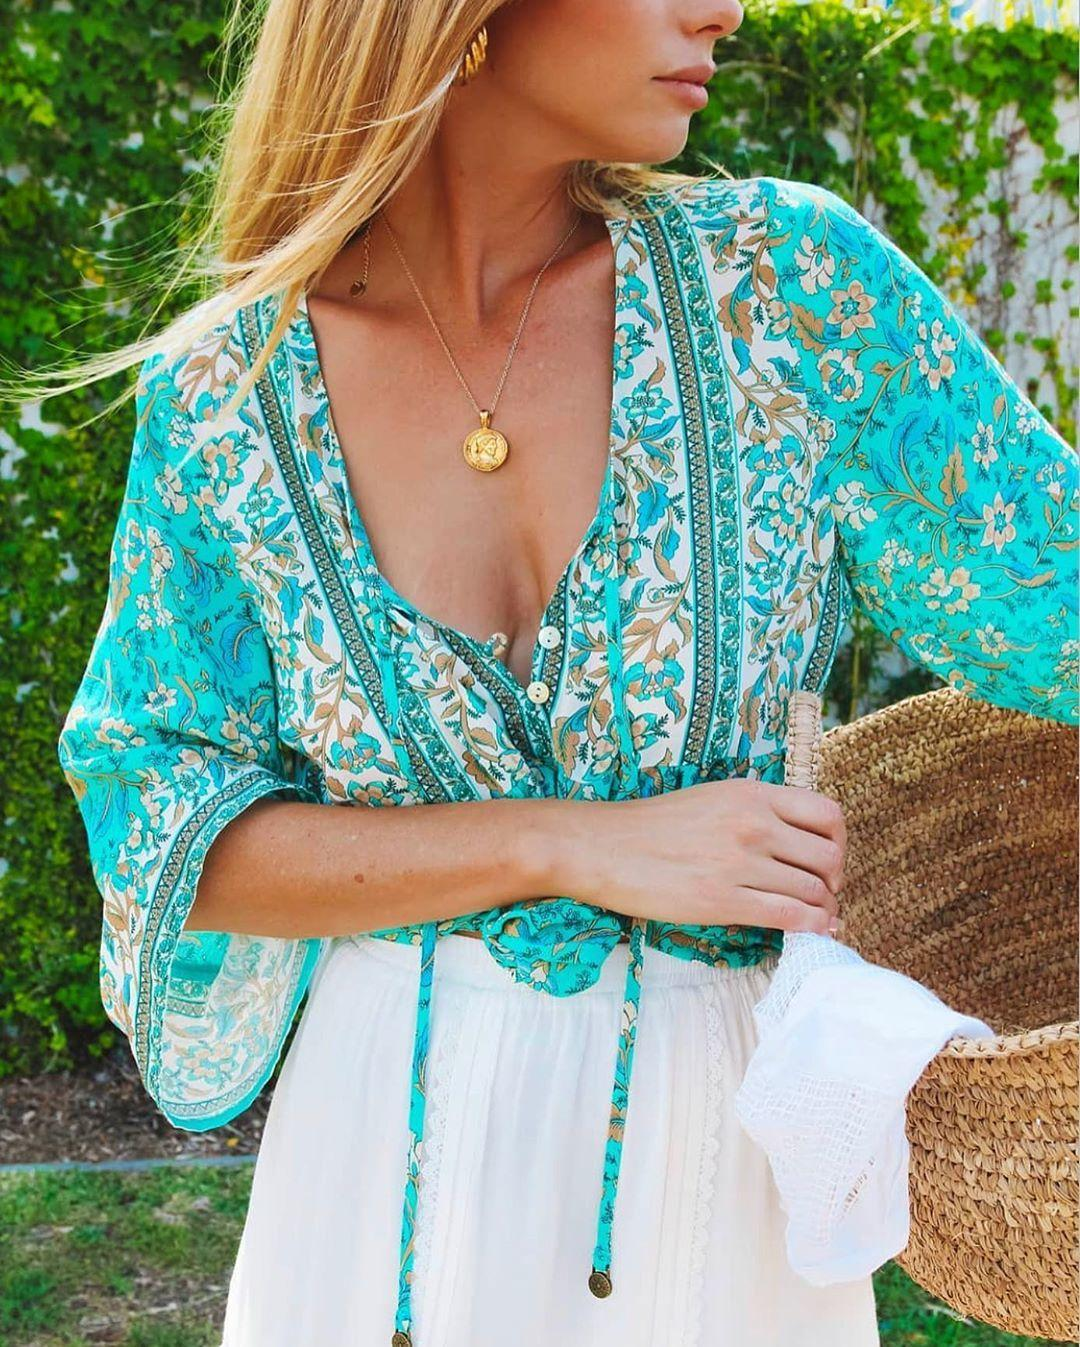 Boho ispirato Green Estate Estate Top Tassel Tie Camicetta Blouse Donne Buttons Cotton Women Top Bohemian Gypsy Laidies Tops Holidas 210302